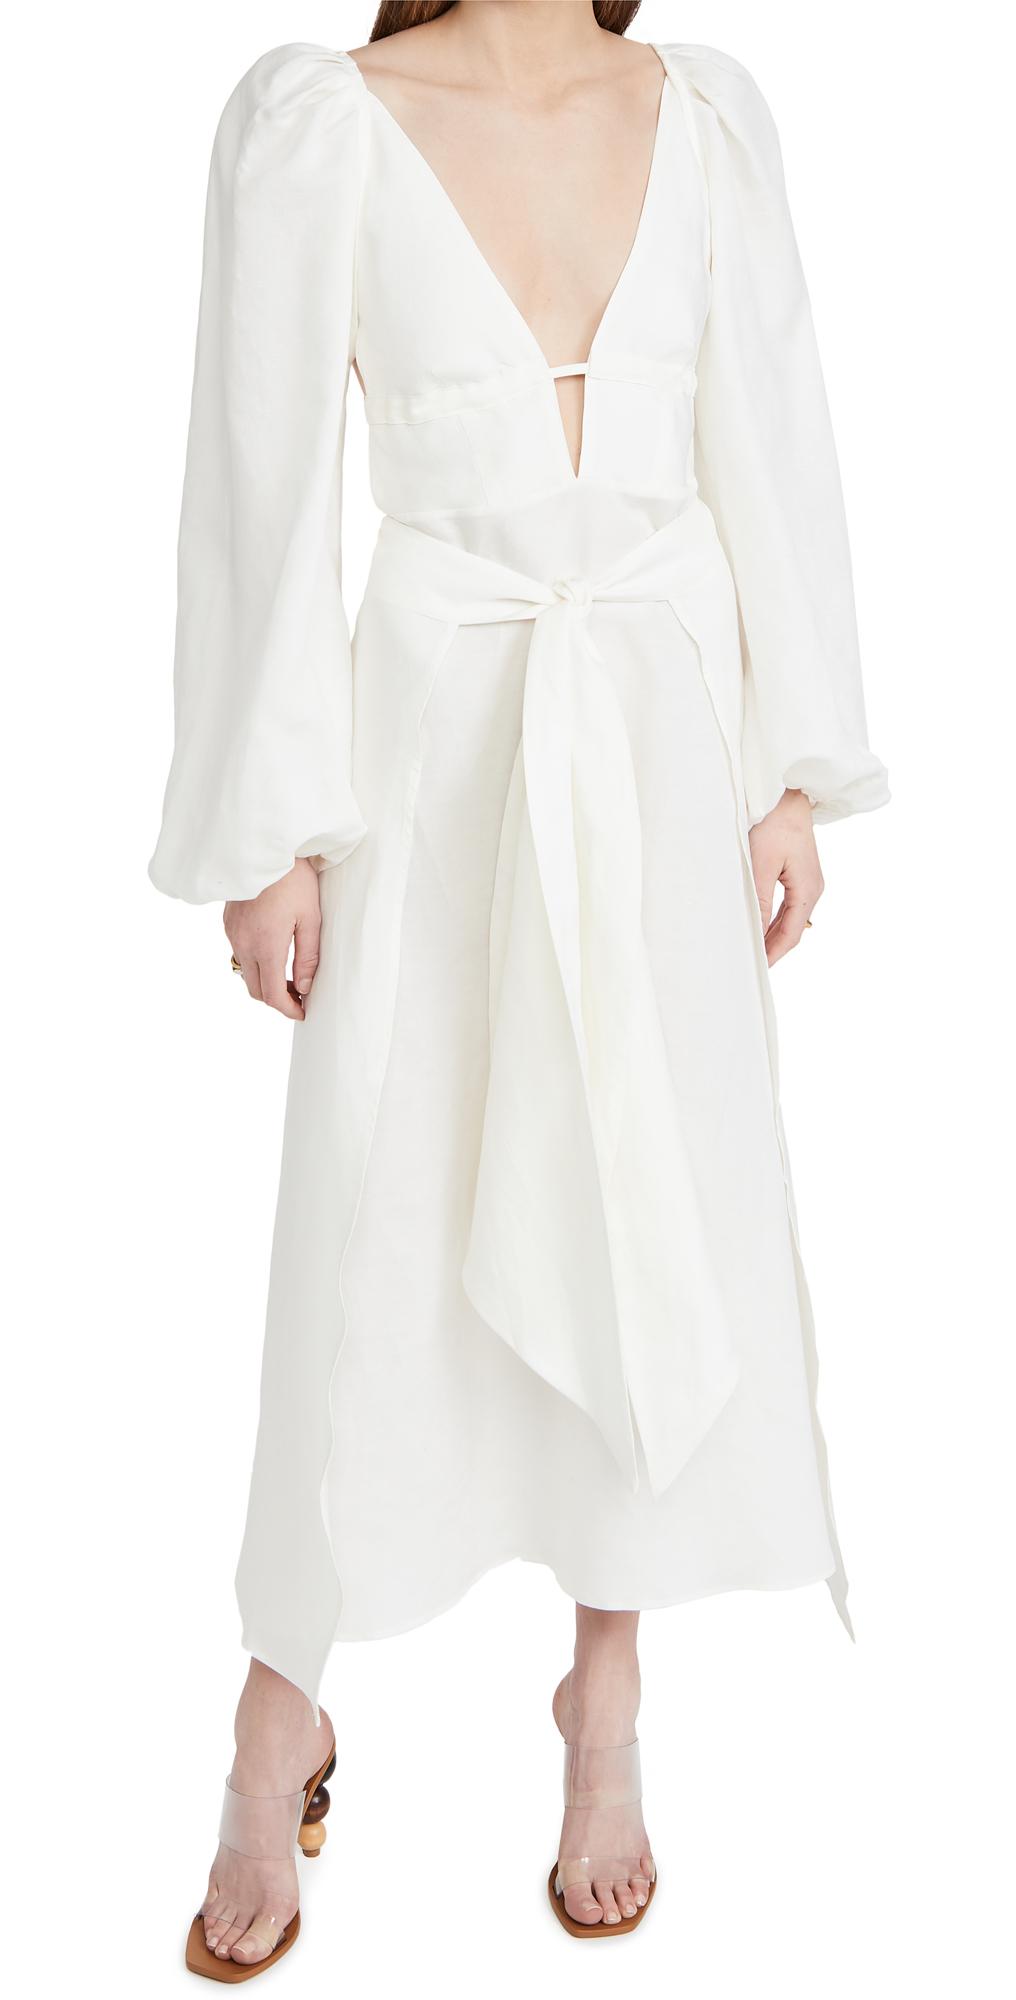 Cult Gaia Larissa Dress